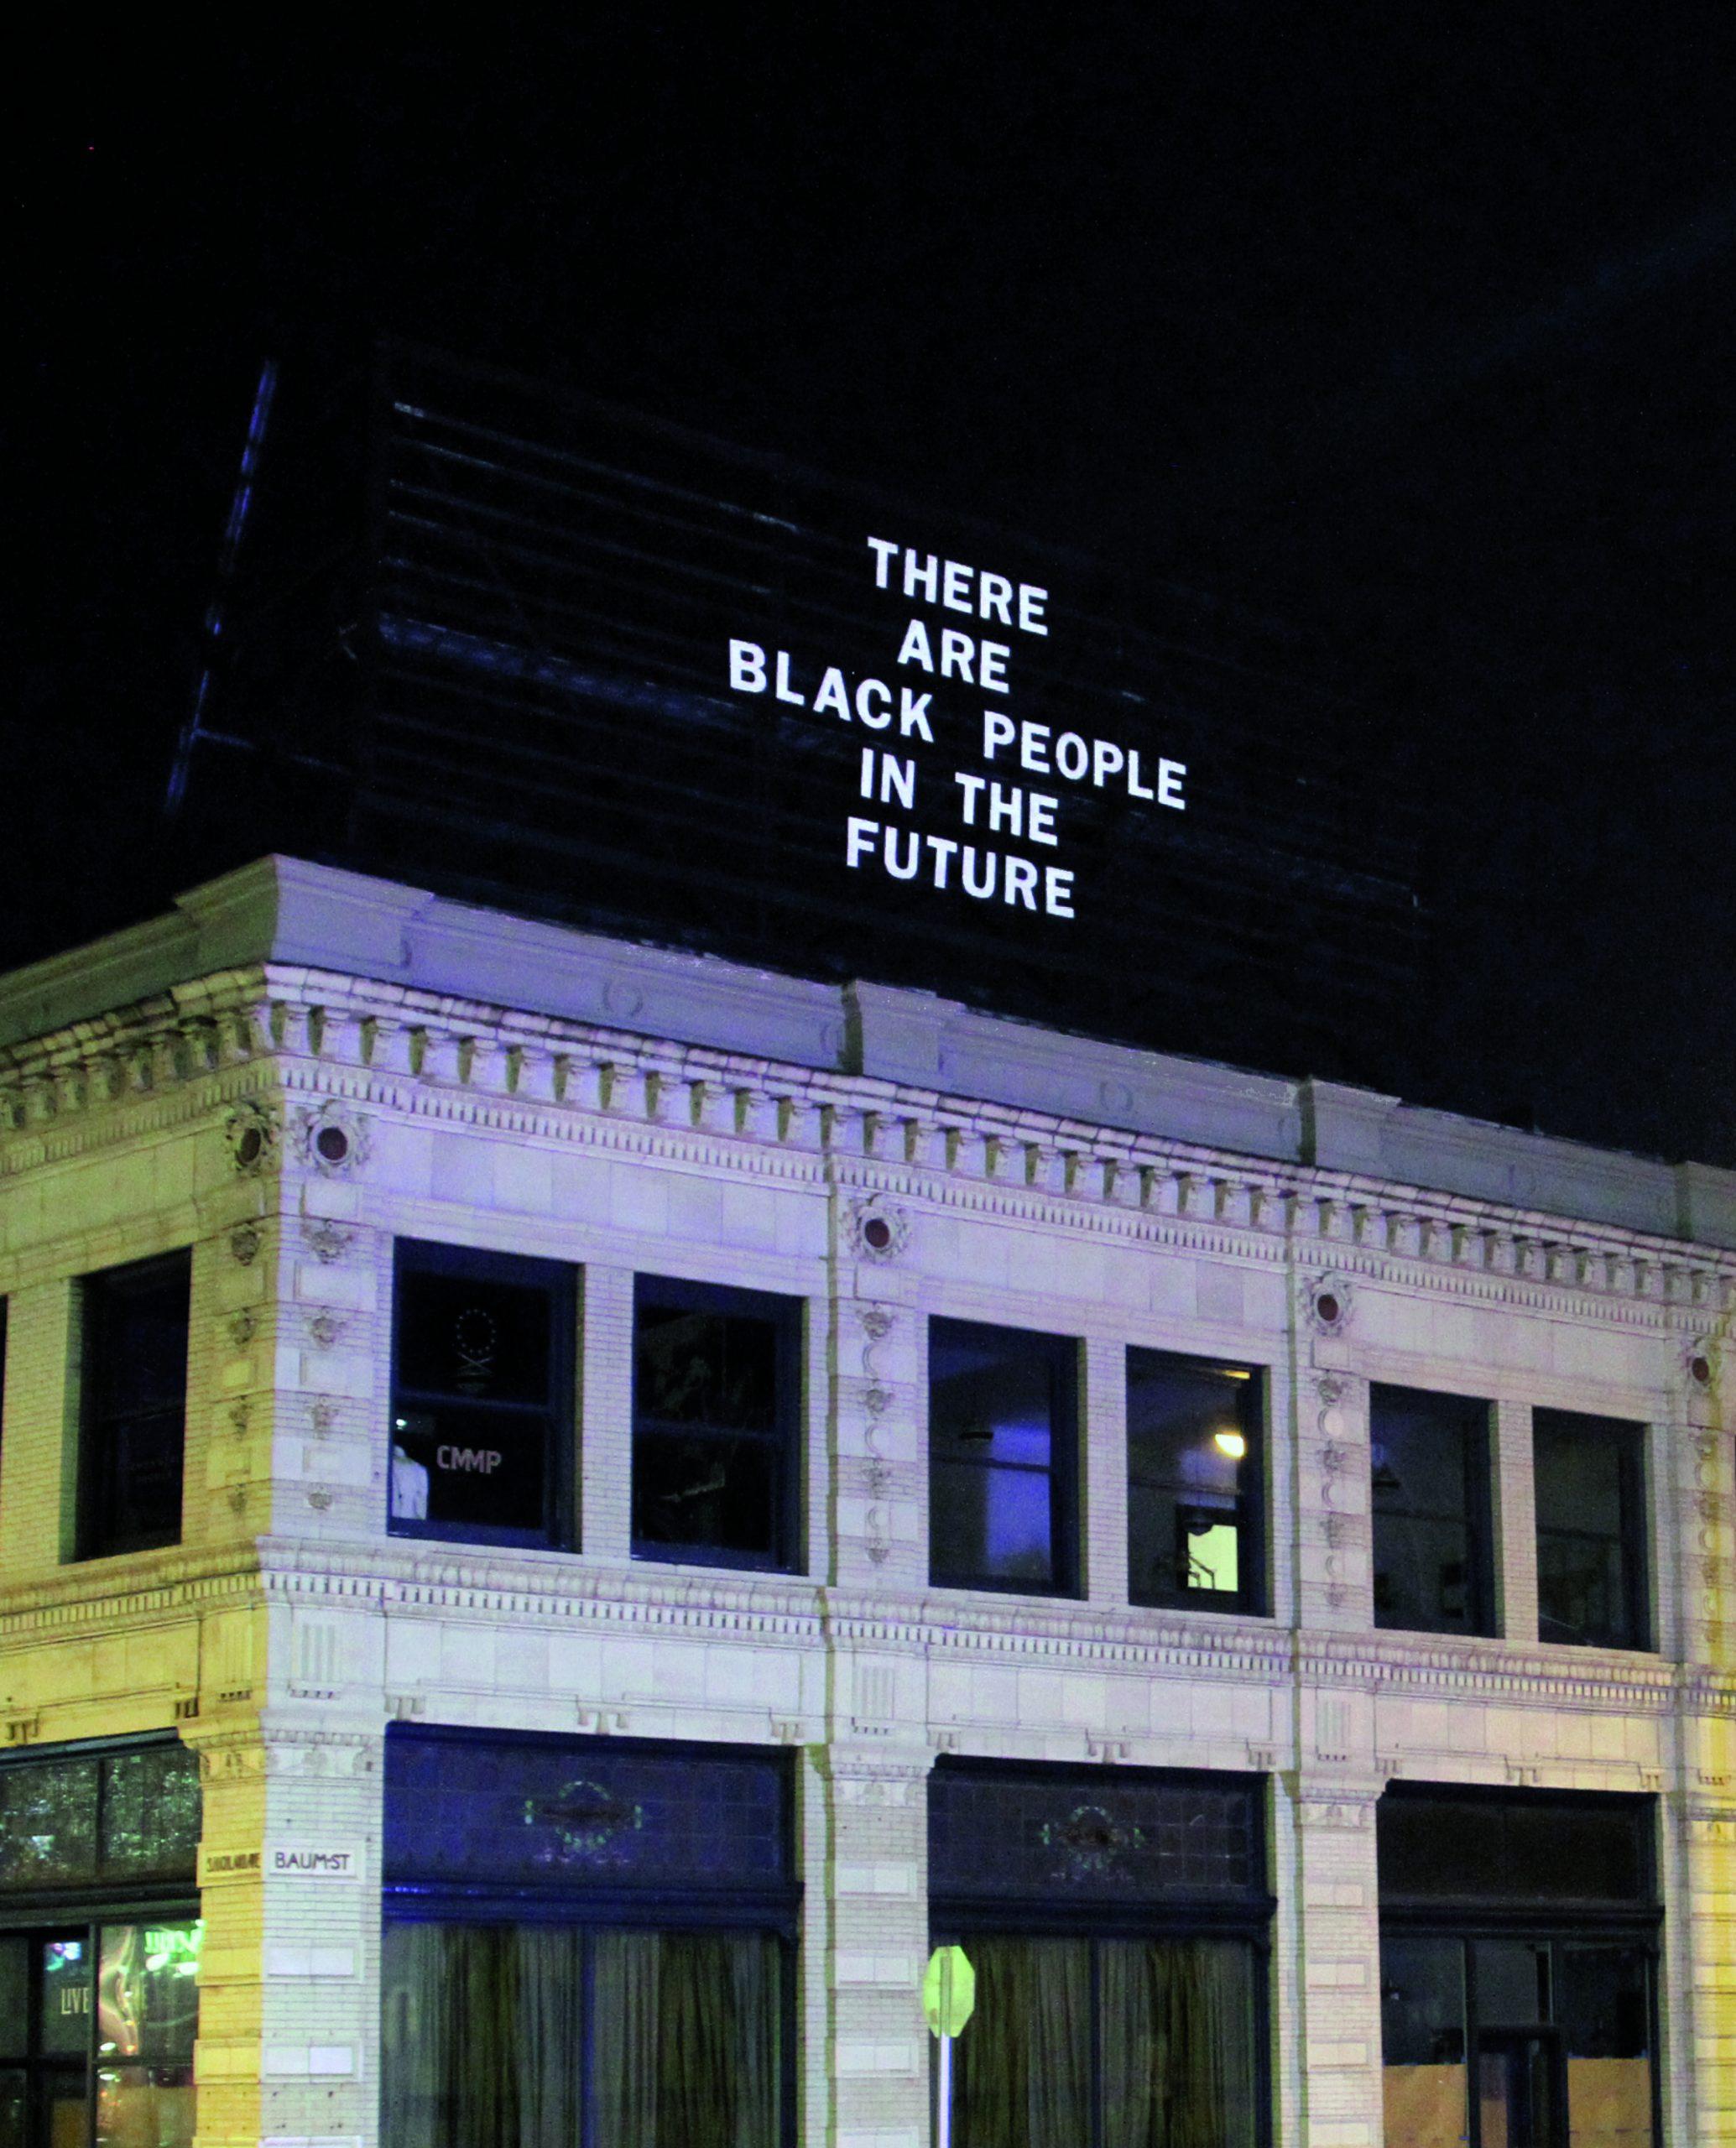 The Last Billboard (Jon Rubin project 2009-2018), Courtesy of the Artist Alisha B. Wormsley 1